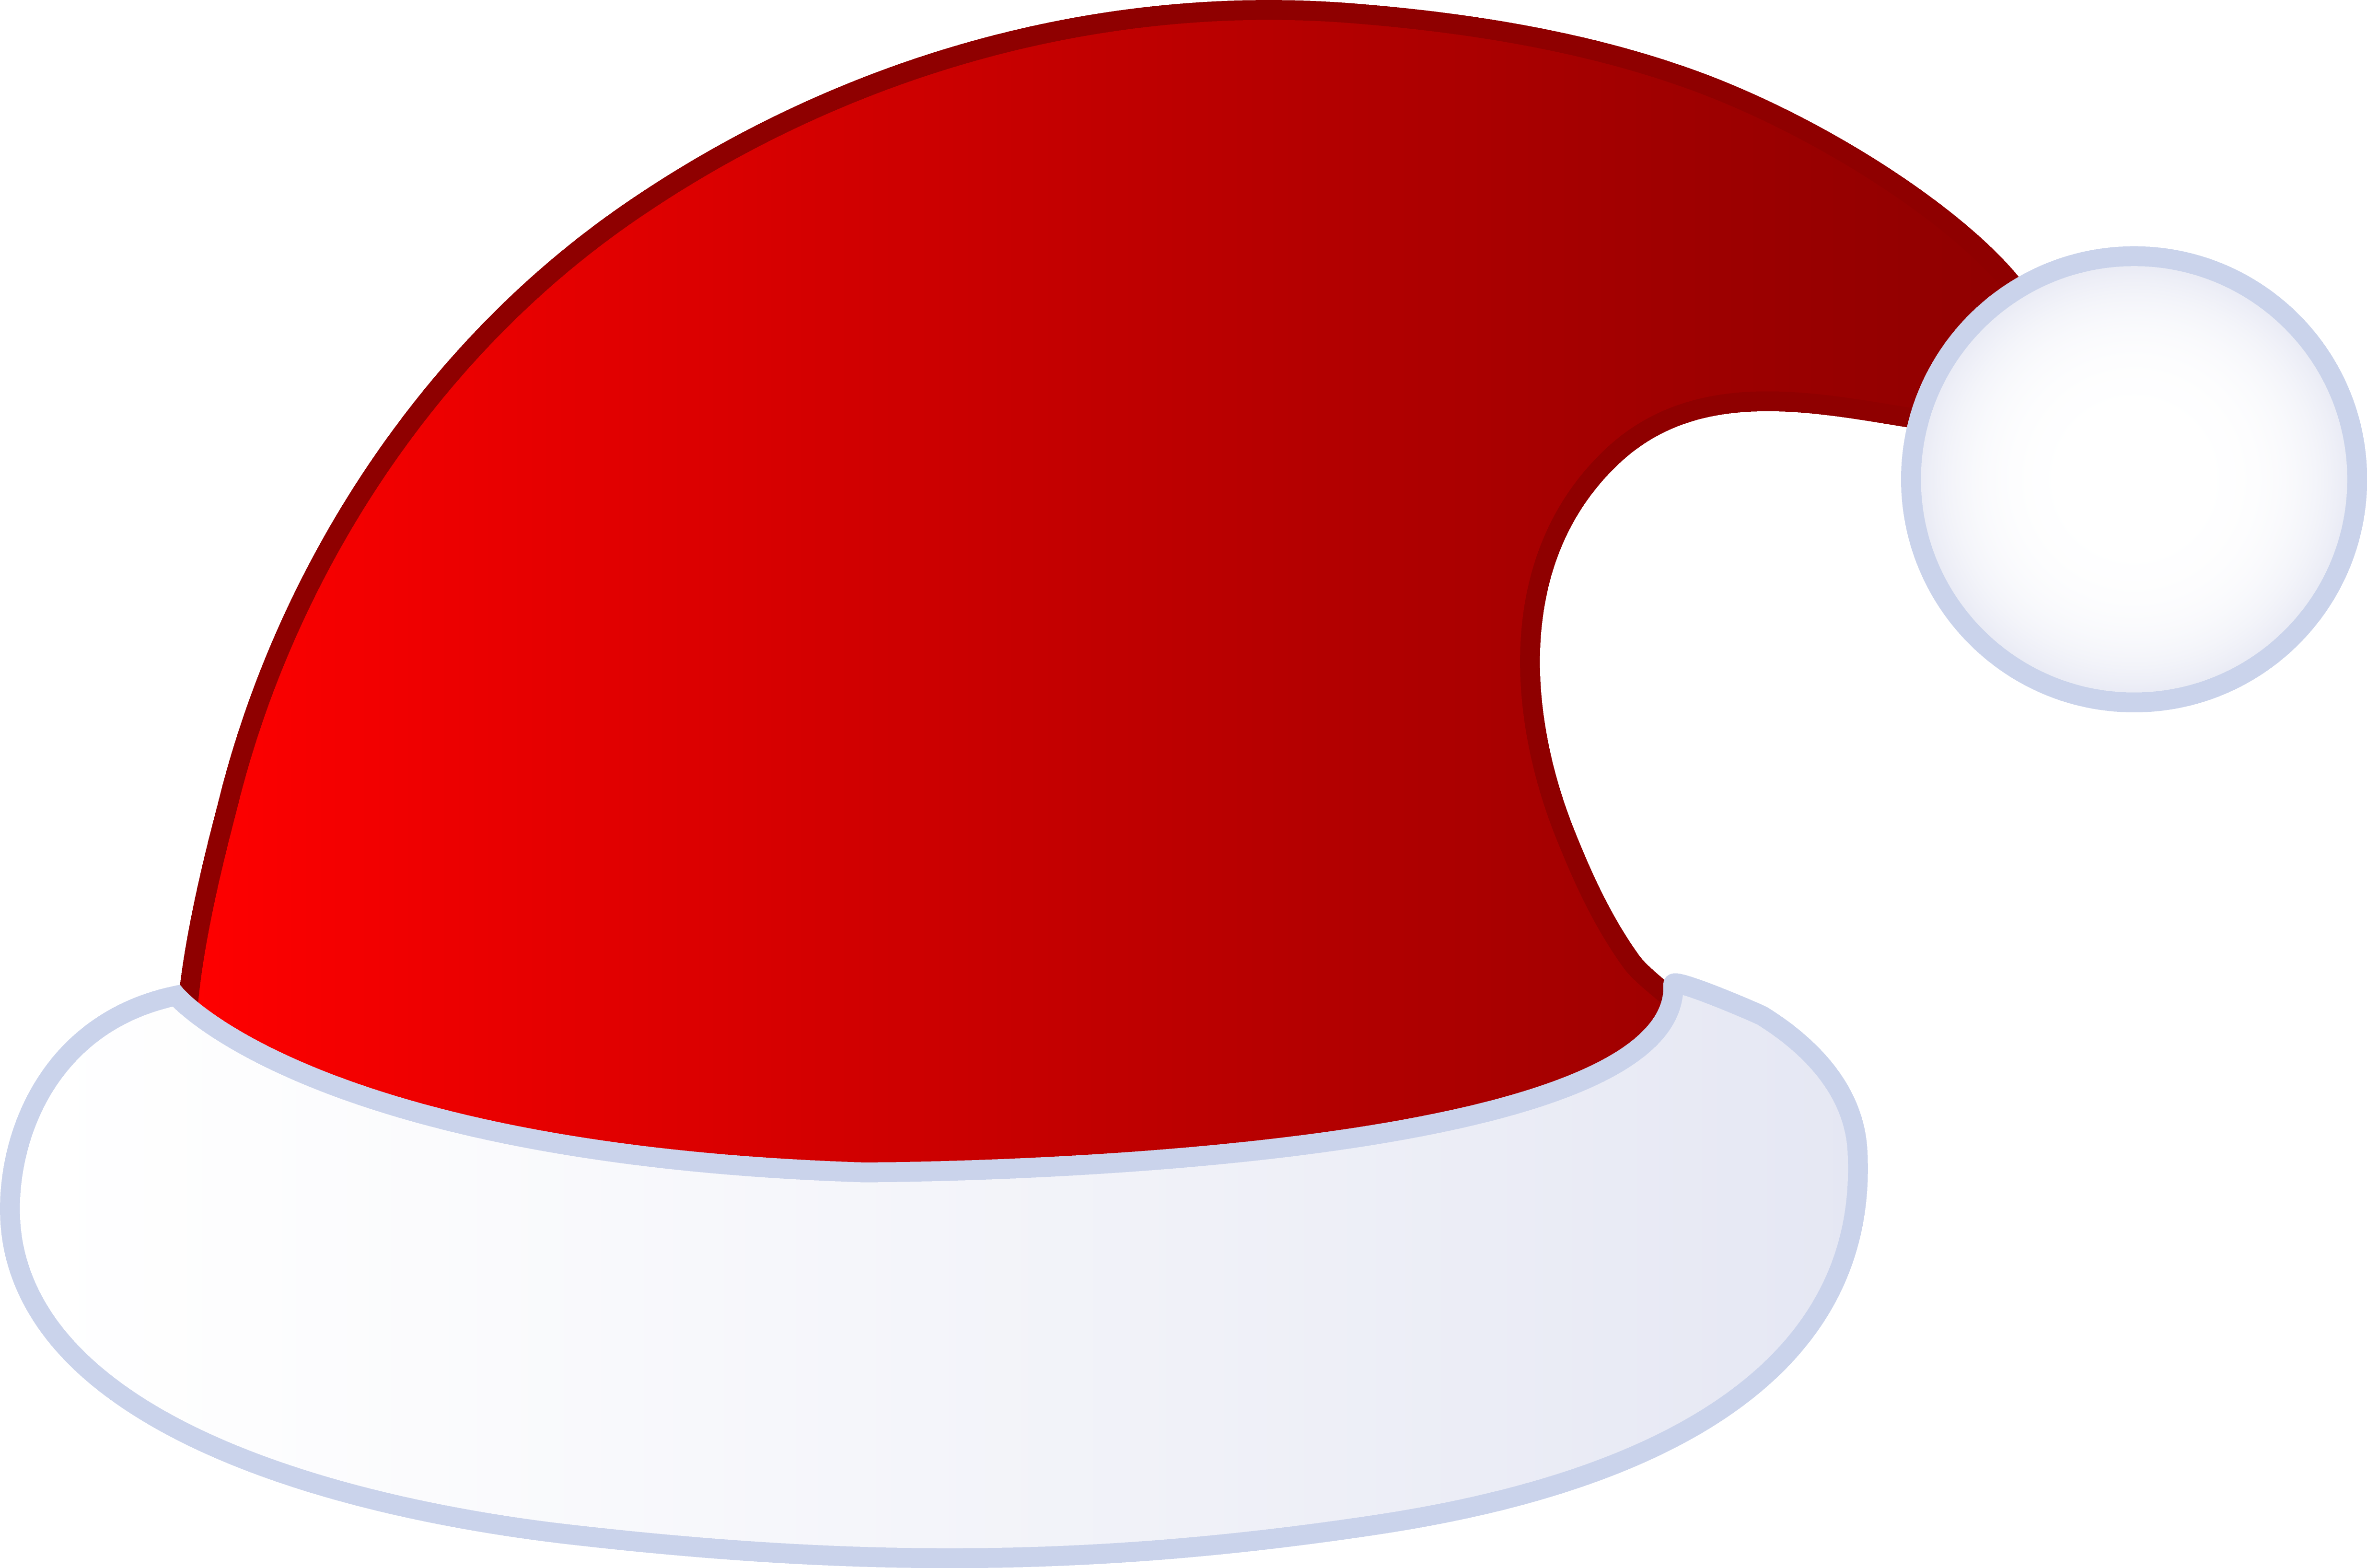 Red Santa Claus Hat - Free Clip Art